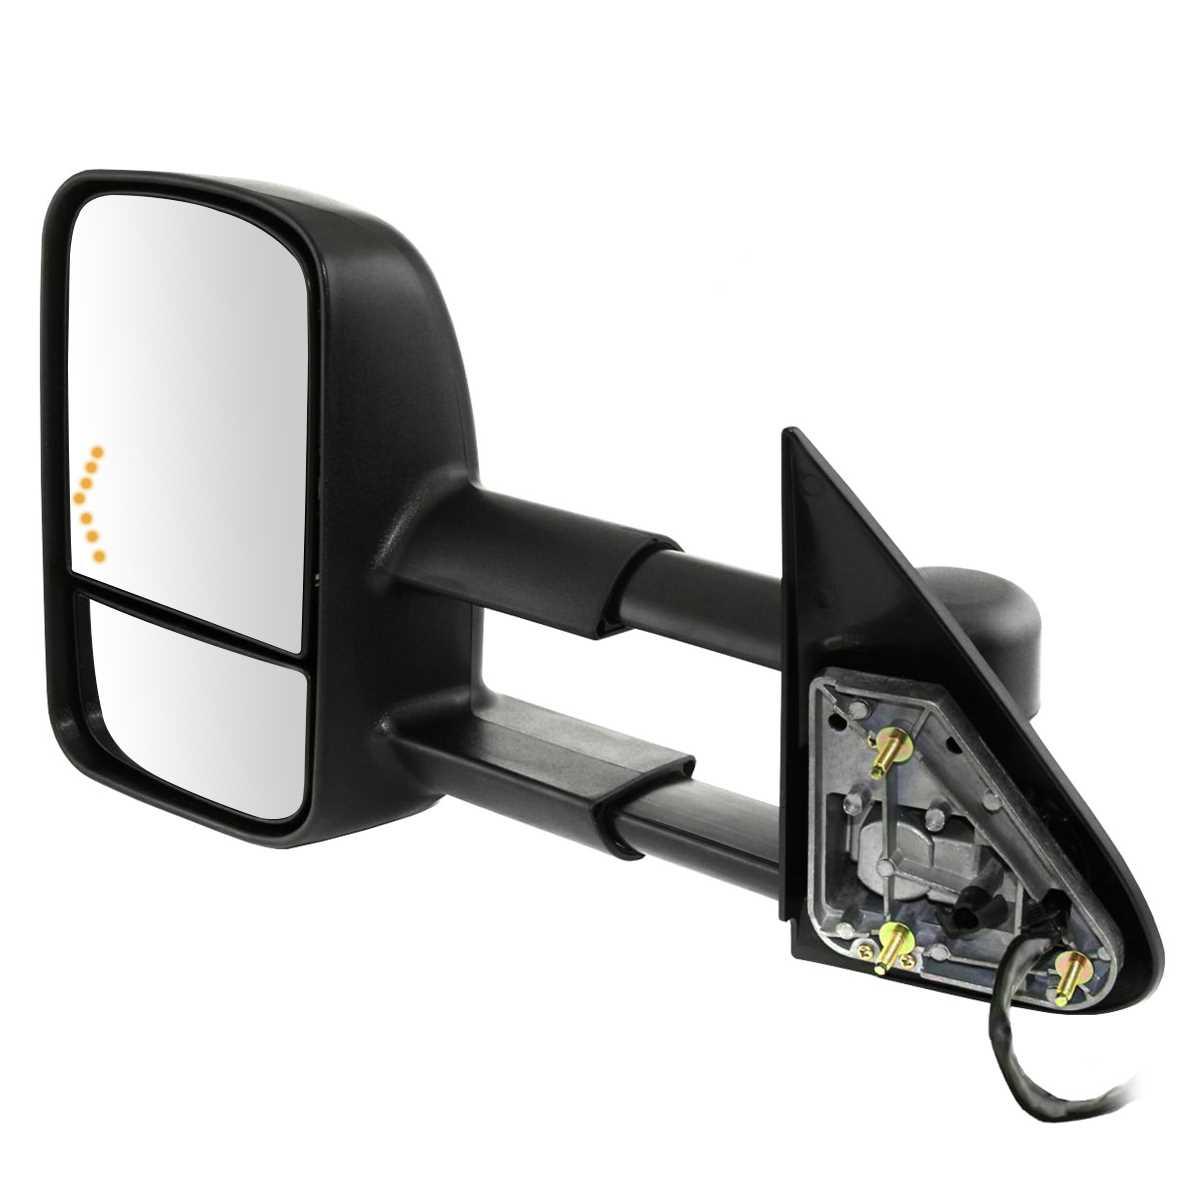 Pair-2-Power-Heated-Signal-Side-Mirror-Fits-2003-2006-Chevrolet-Silverado-1500 thumbnail 7